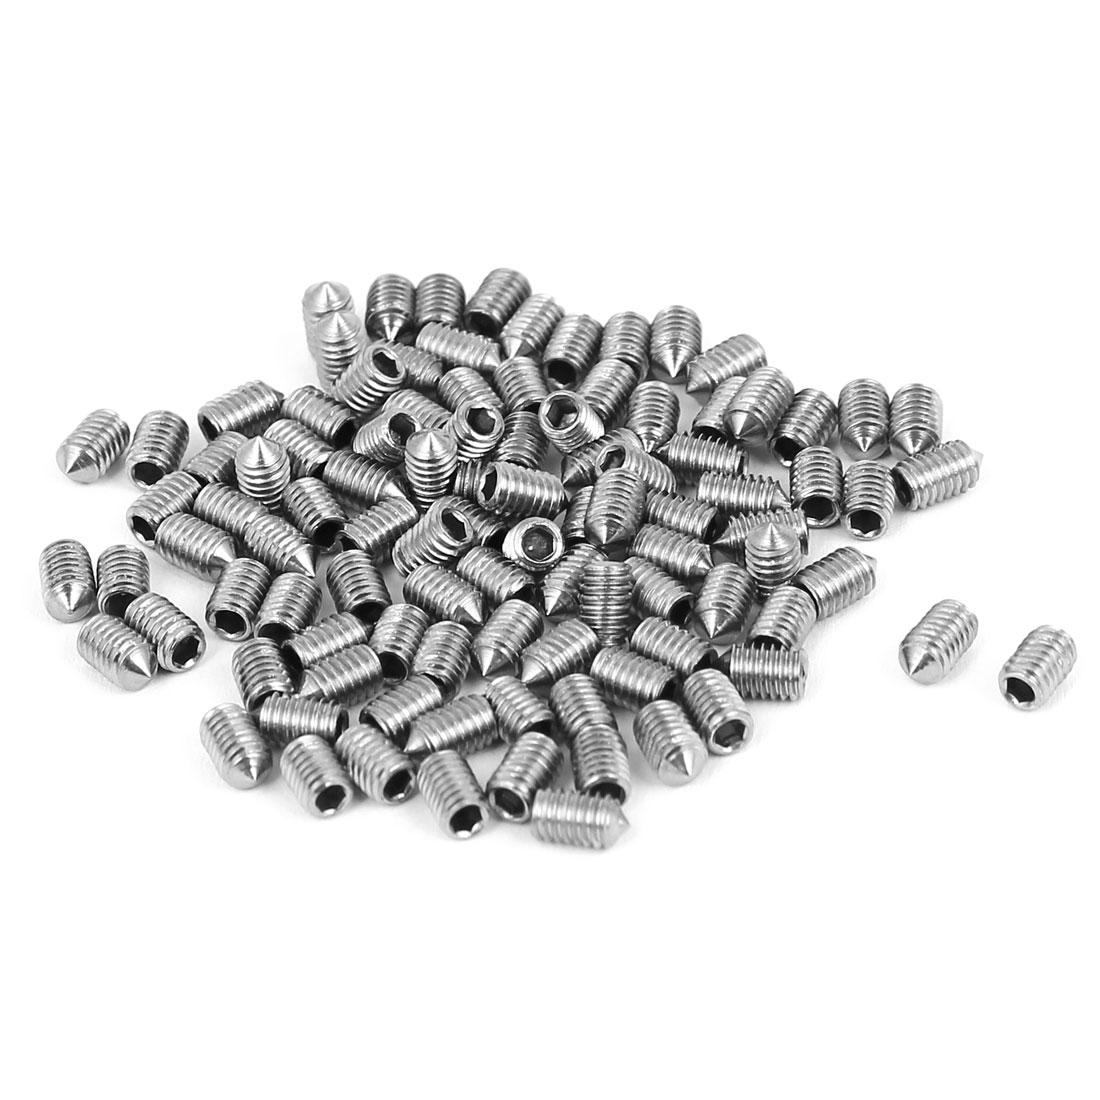 M3x5mm Stainless Steel Cone Point Grub Screws Hex Socket Set Screw 100pcs